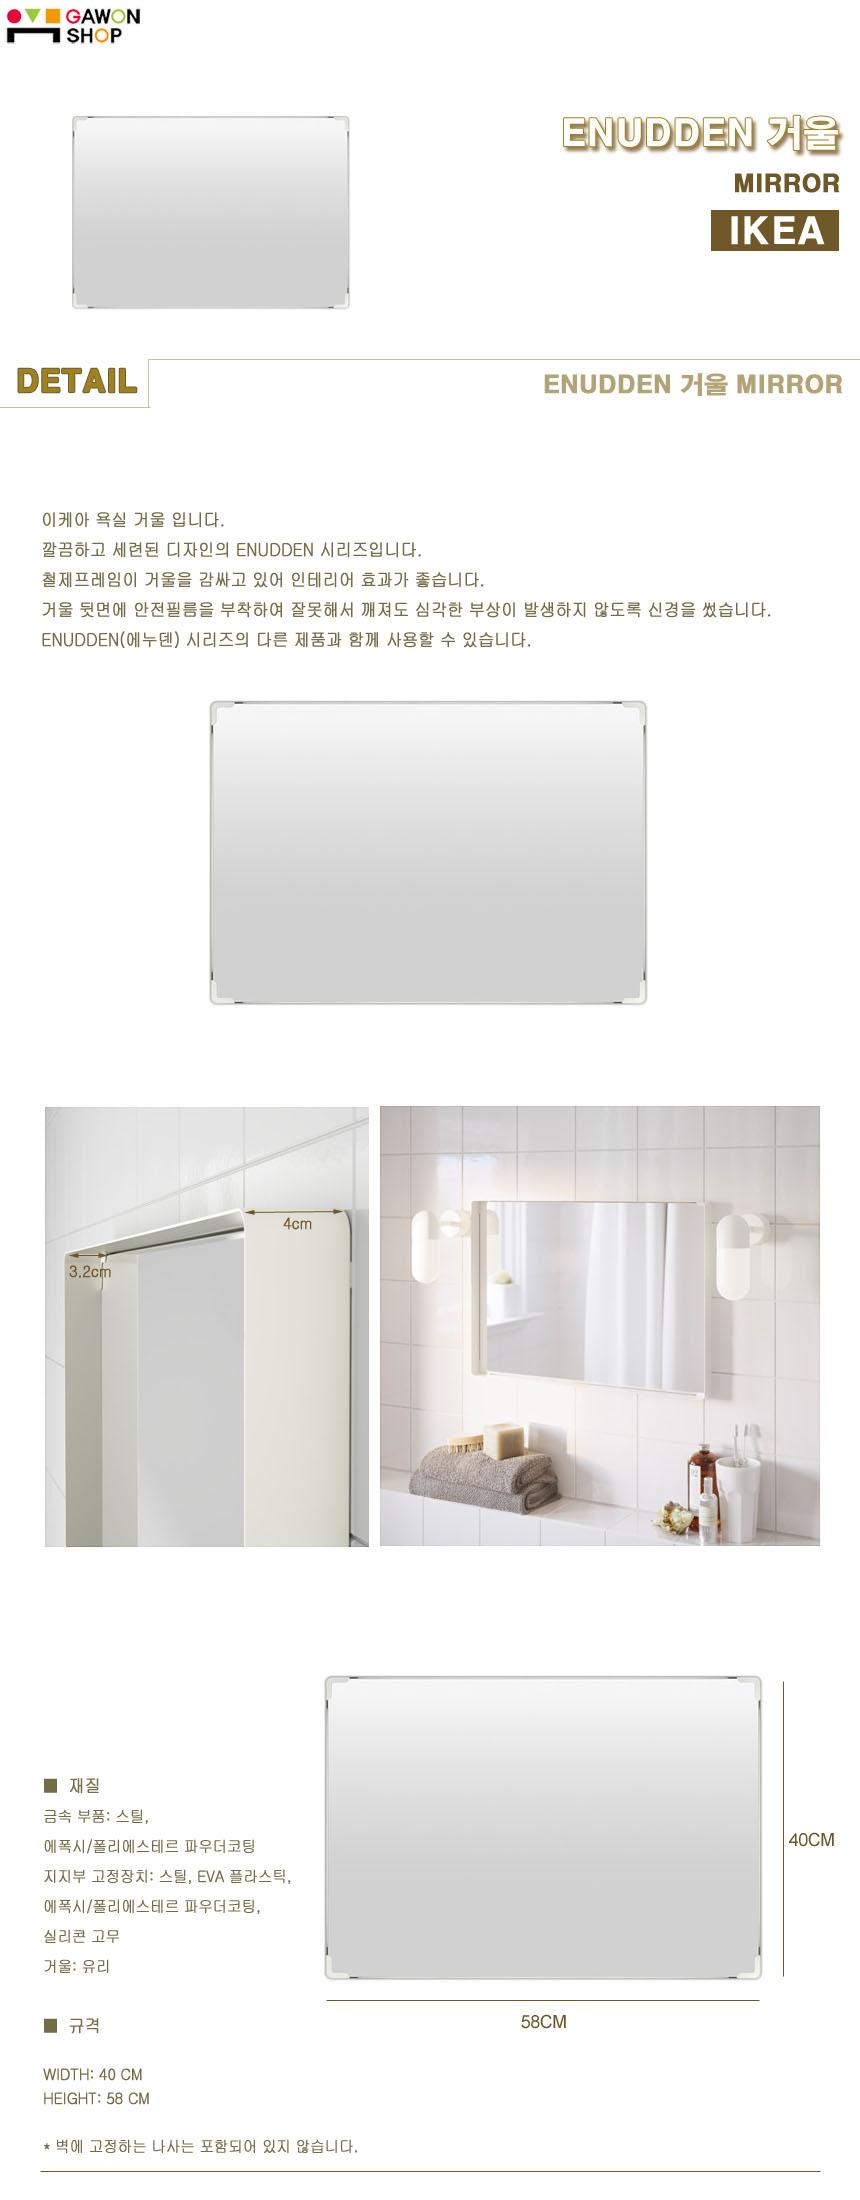 ENUDDEN 거울 (58x40cm) - 이케아, 37,200원, 거울, 벽걸이거울